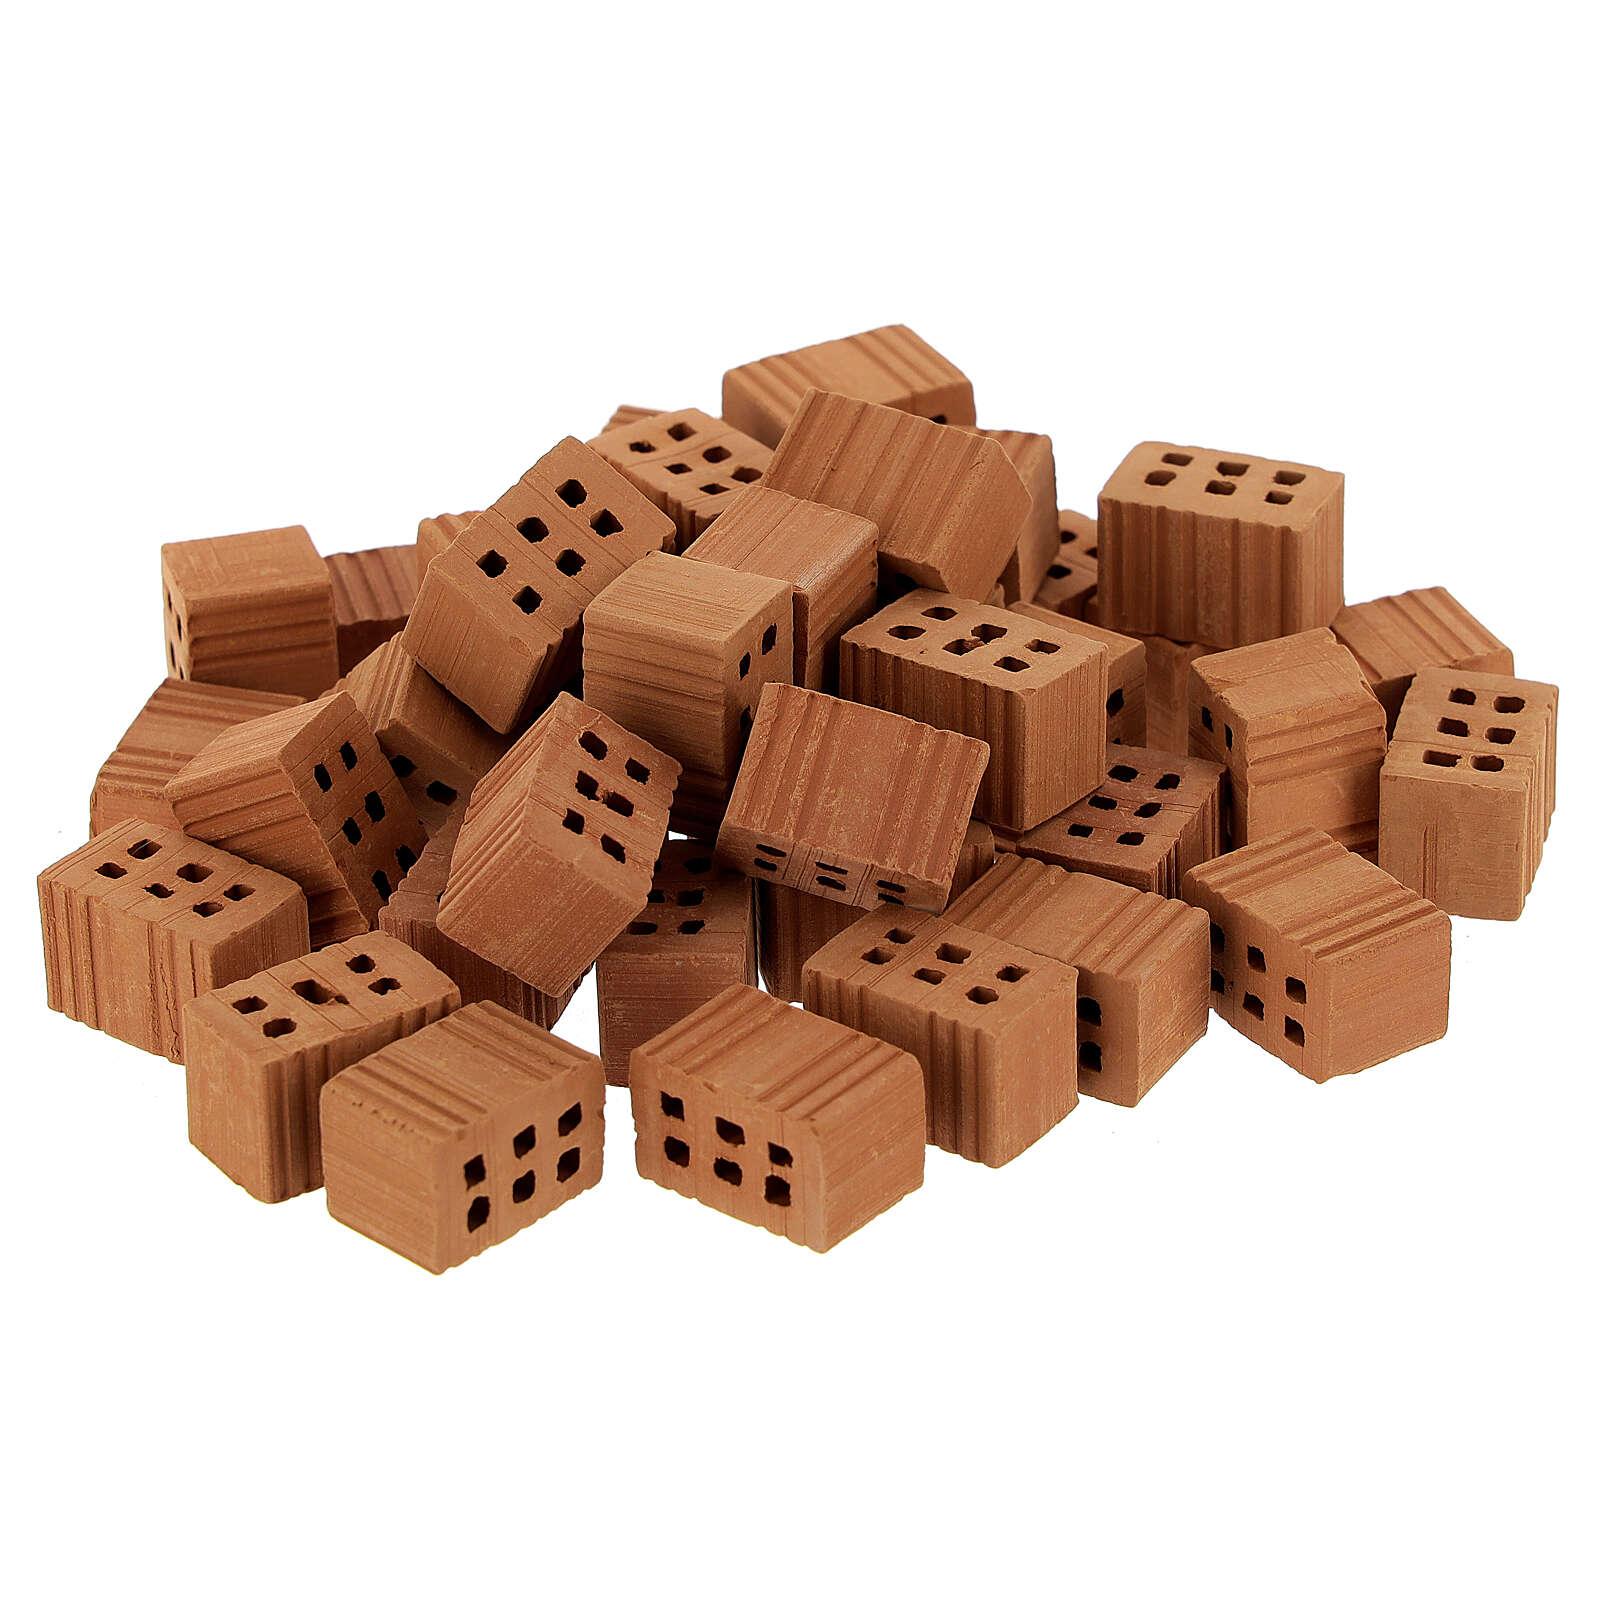 Tijolos terracota miniaturas 1x1,5x1 cm para presépio, 100 unidades 4